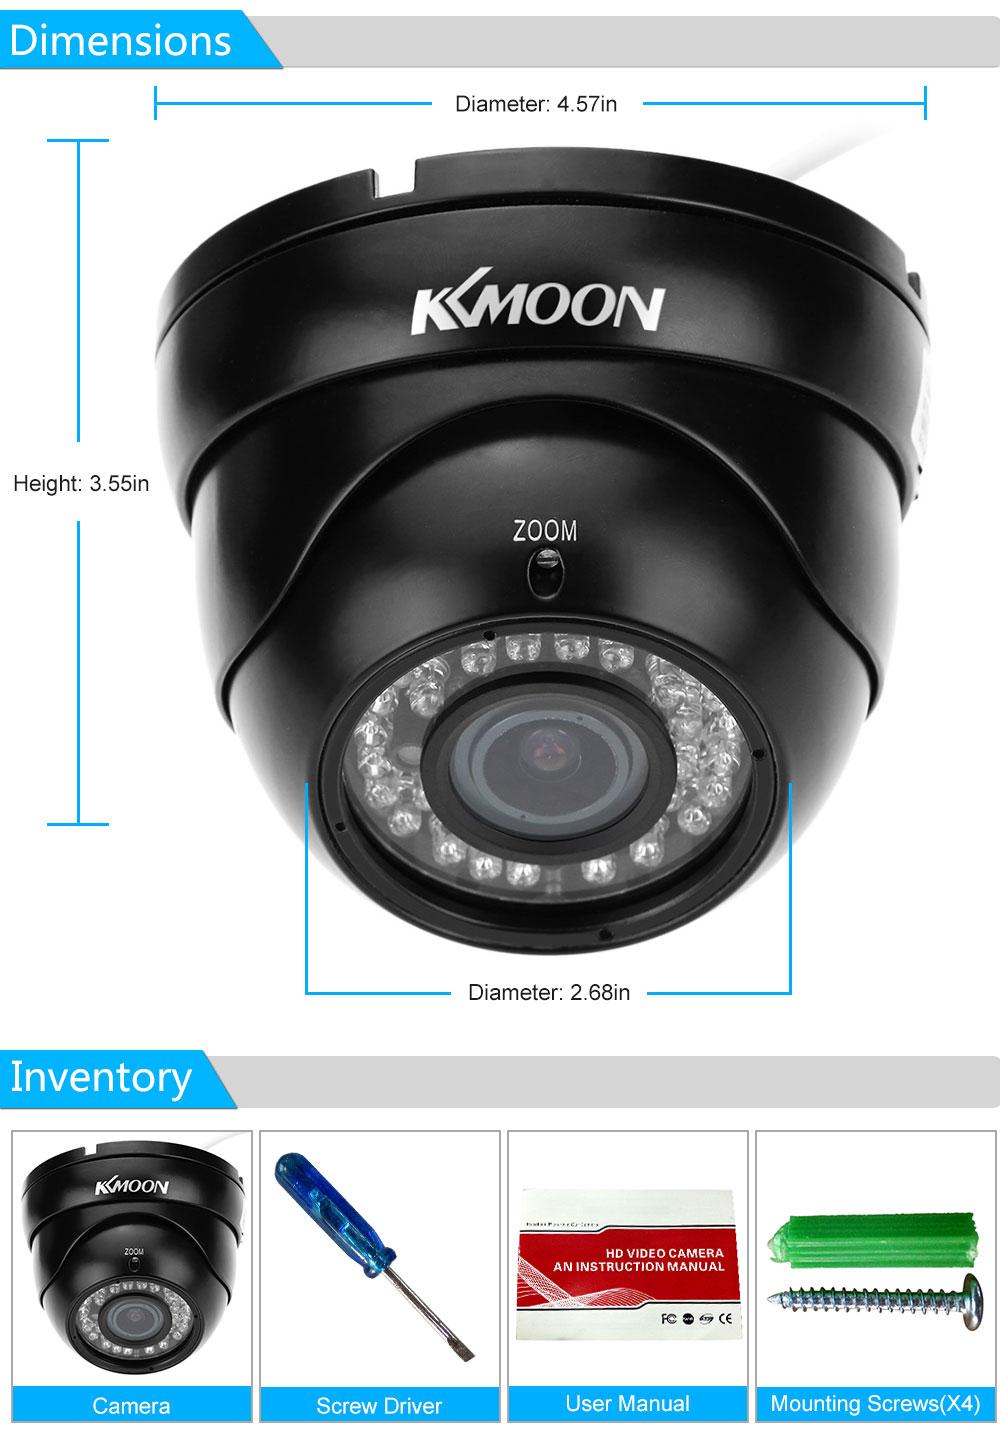 kkmoon ip camera instructions